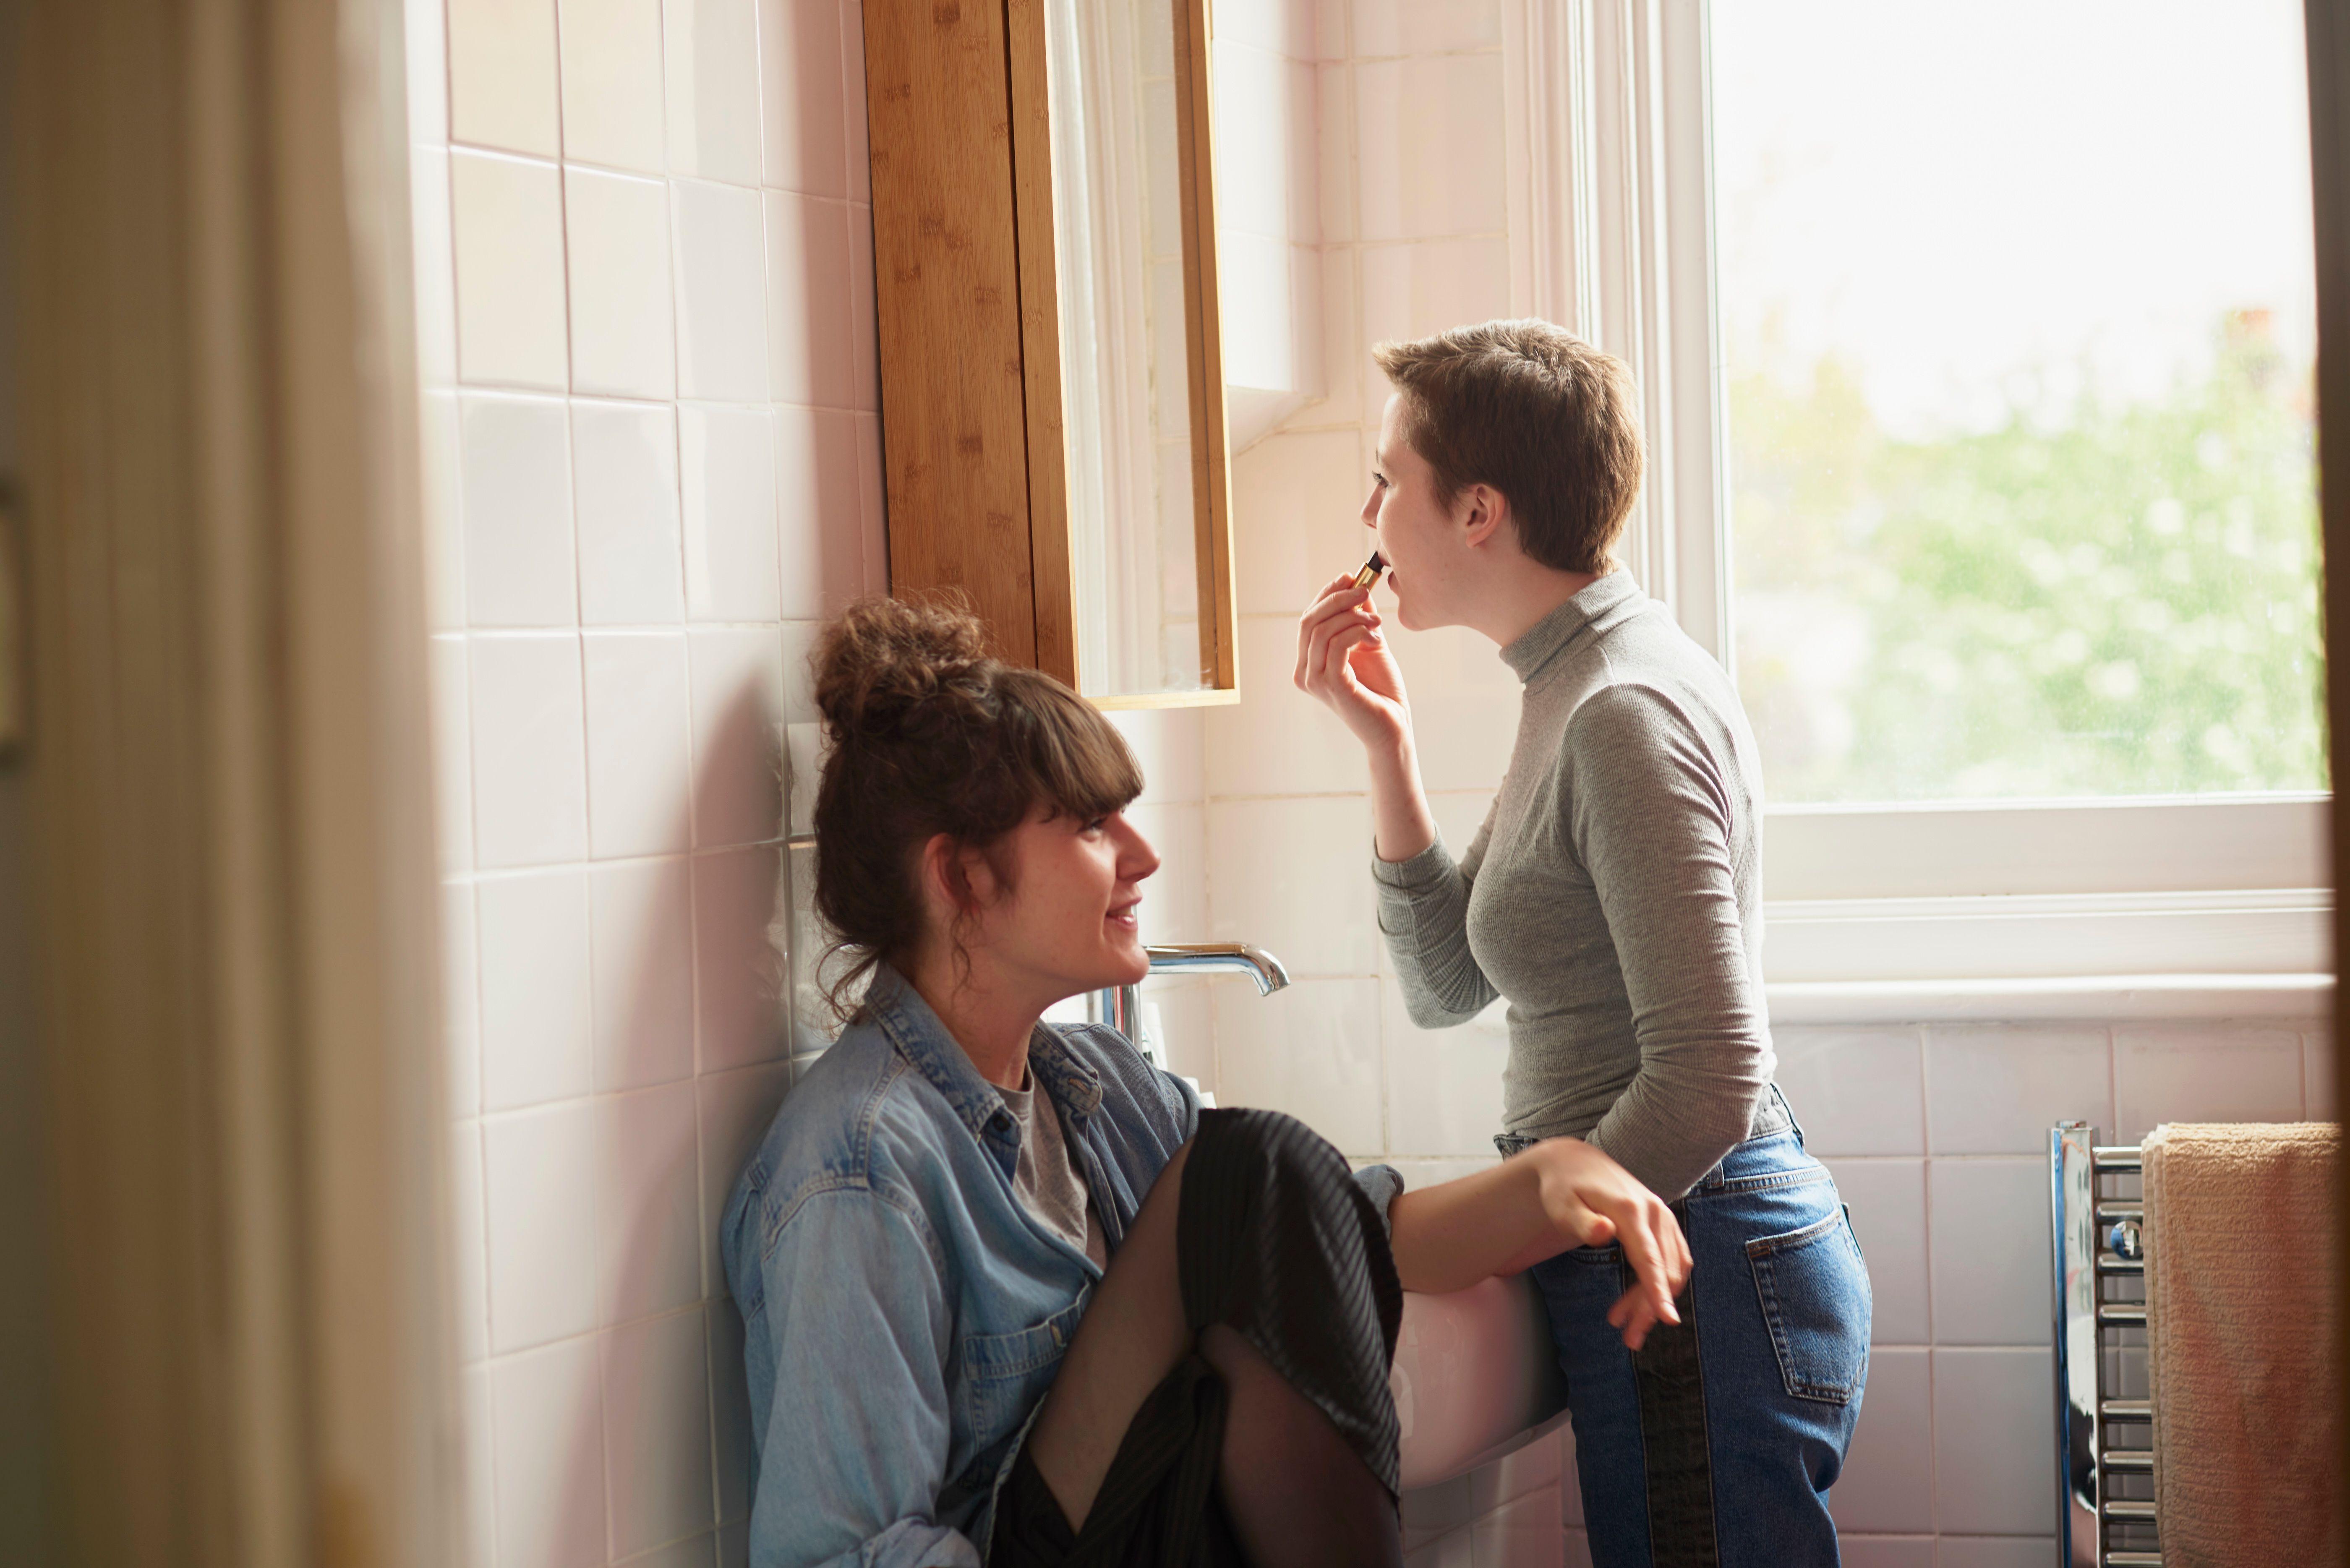 Friends chatting in bathroom